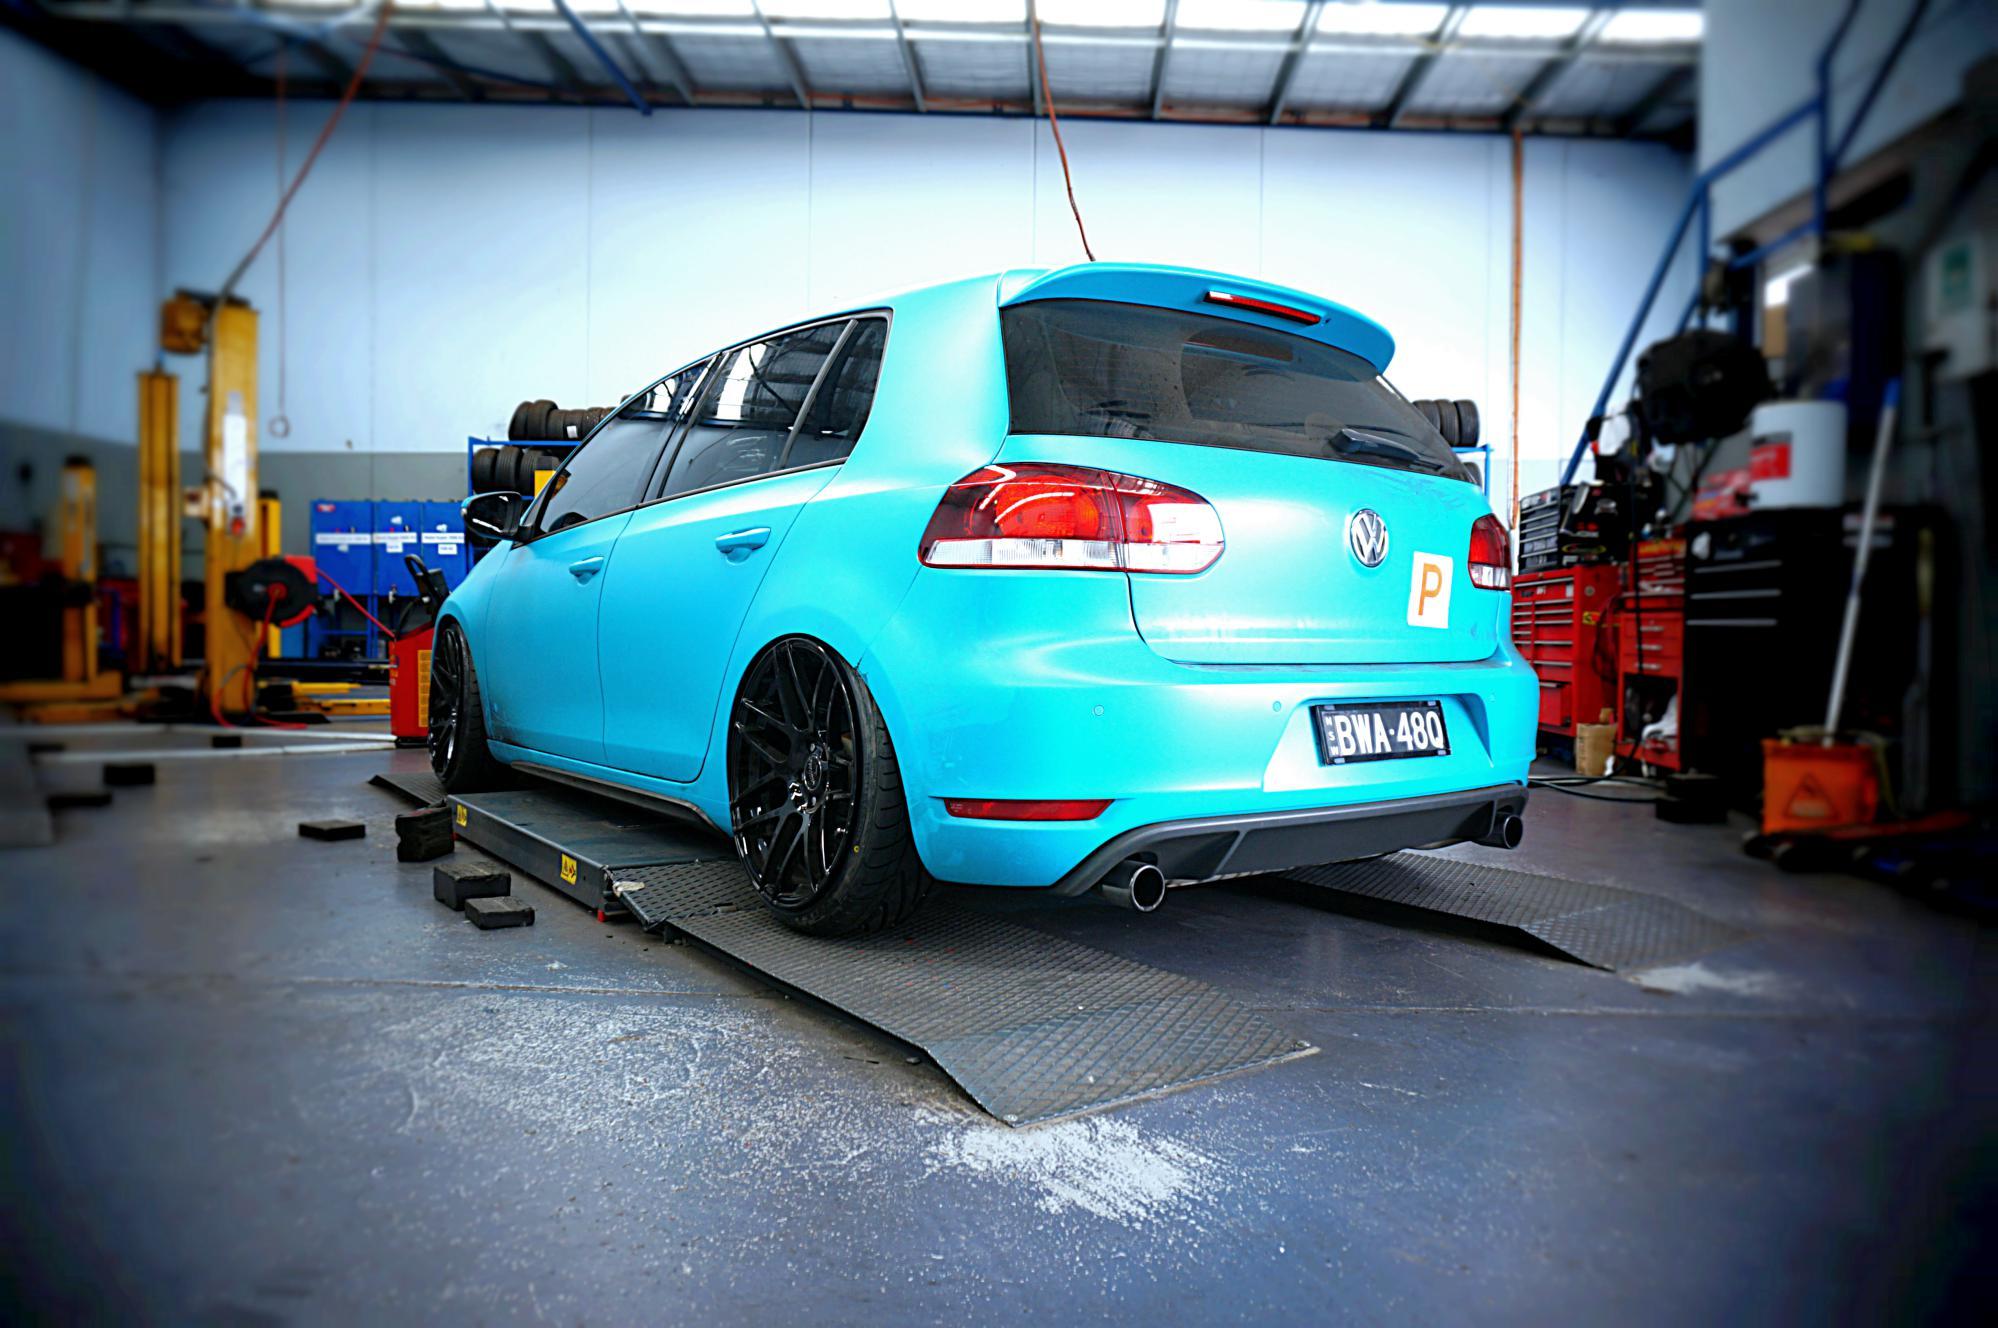 Volkswagen Golf Mk6 GTI, millimetre perfect stance